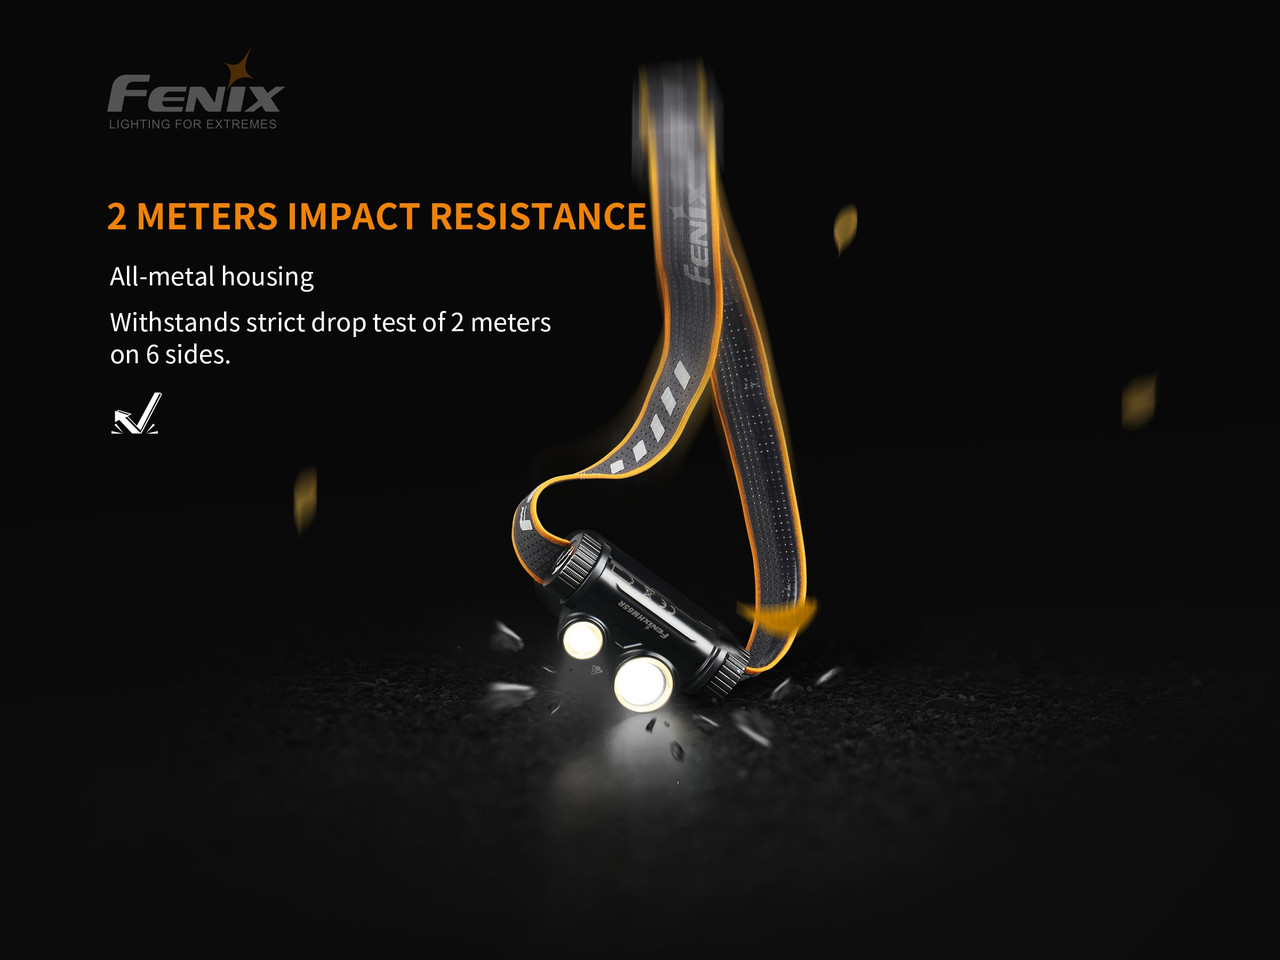 Fenix HM65R 1400 Lumen Headlamp. Dual Light Source (HM65R)